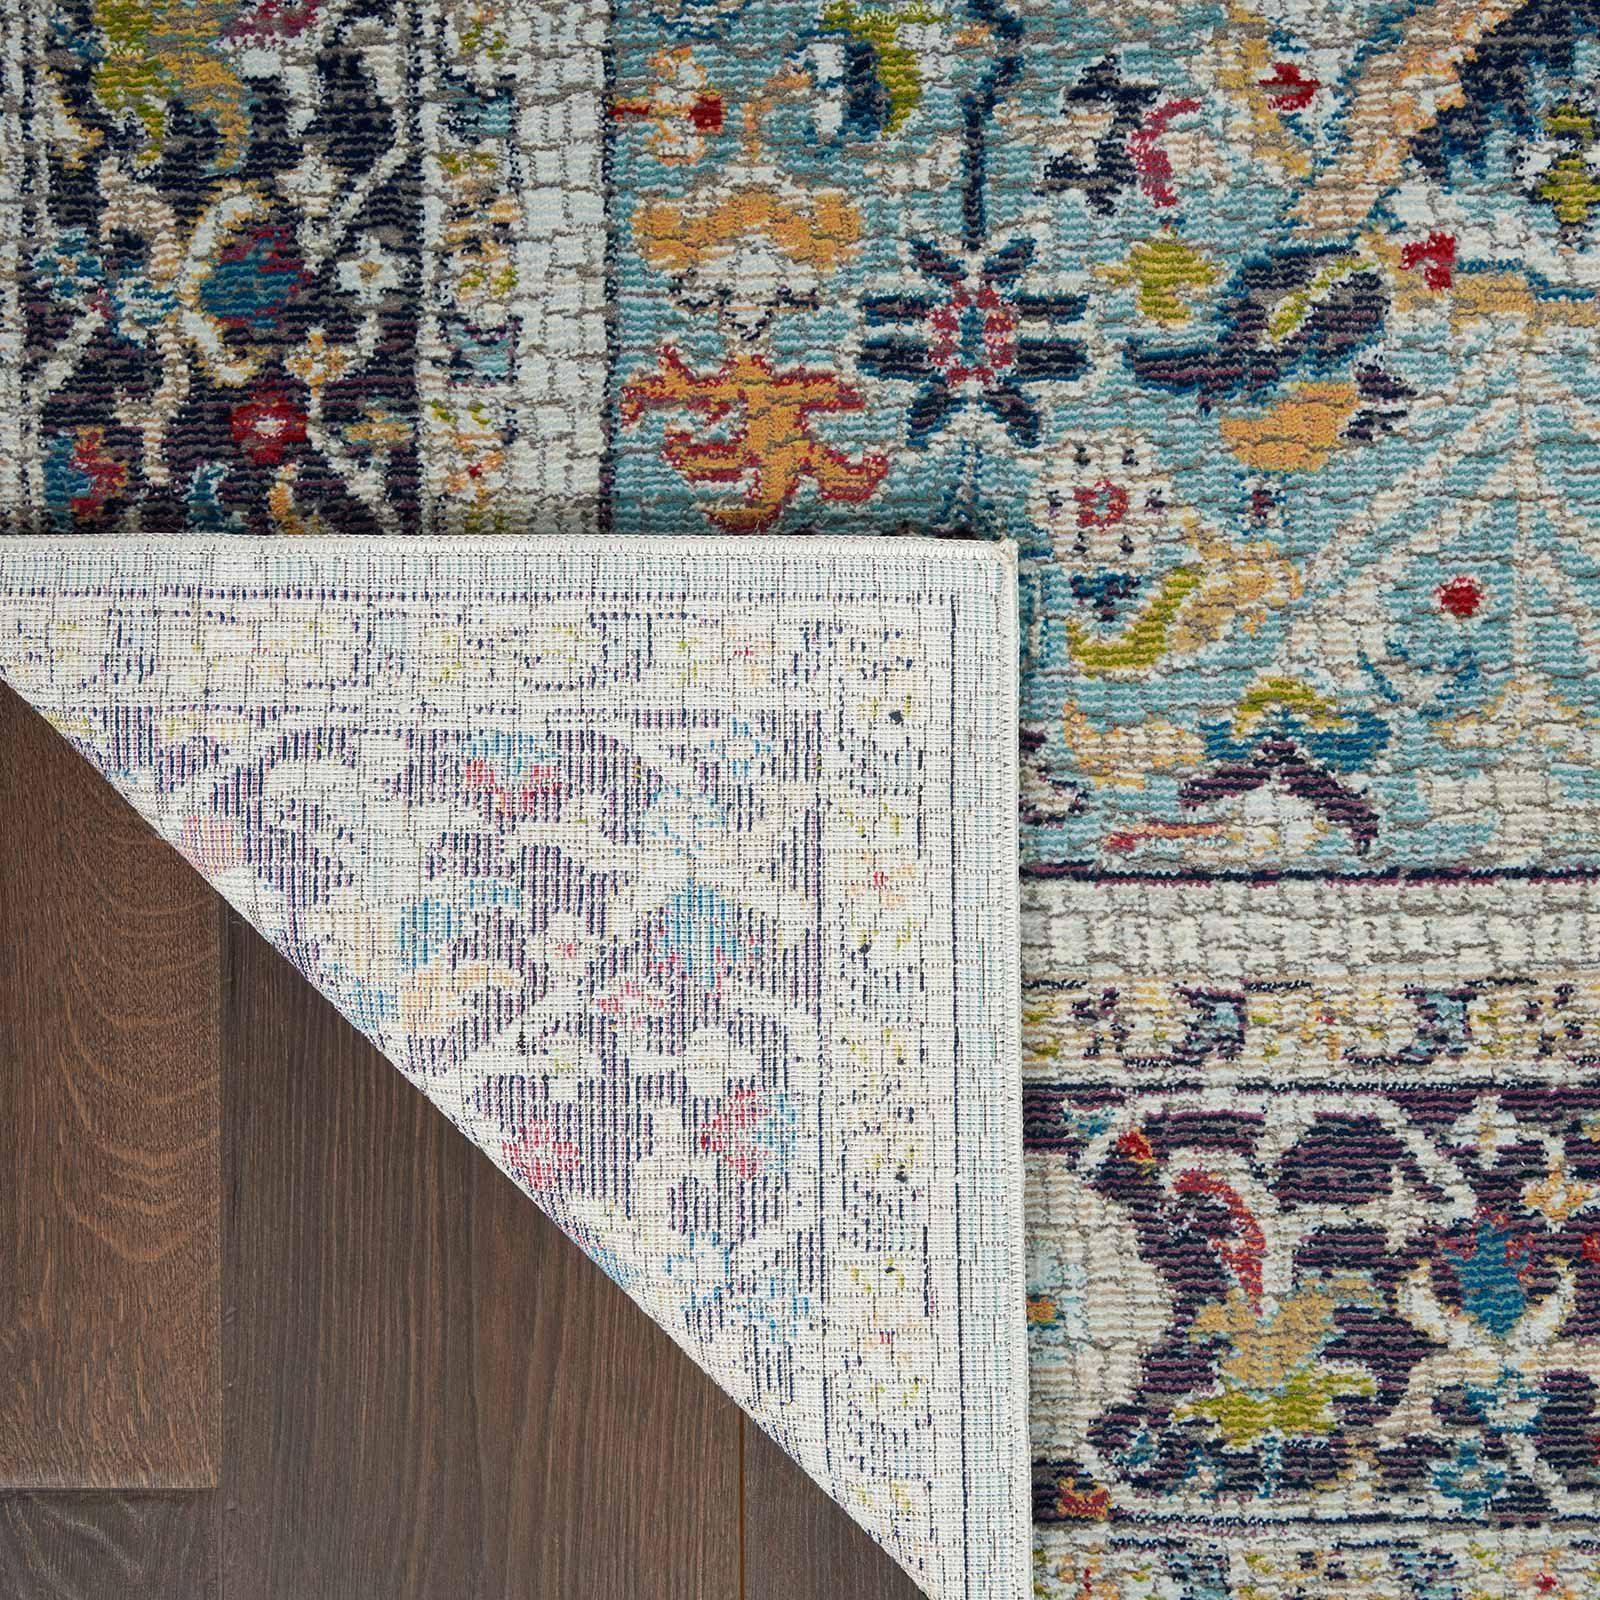 Nourison rug Ankara Global ANR14 TEAL MULTI 5x8 099446498441 CRB